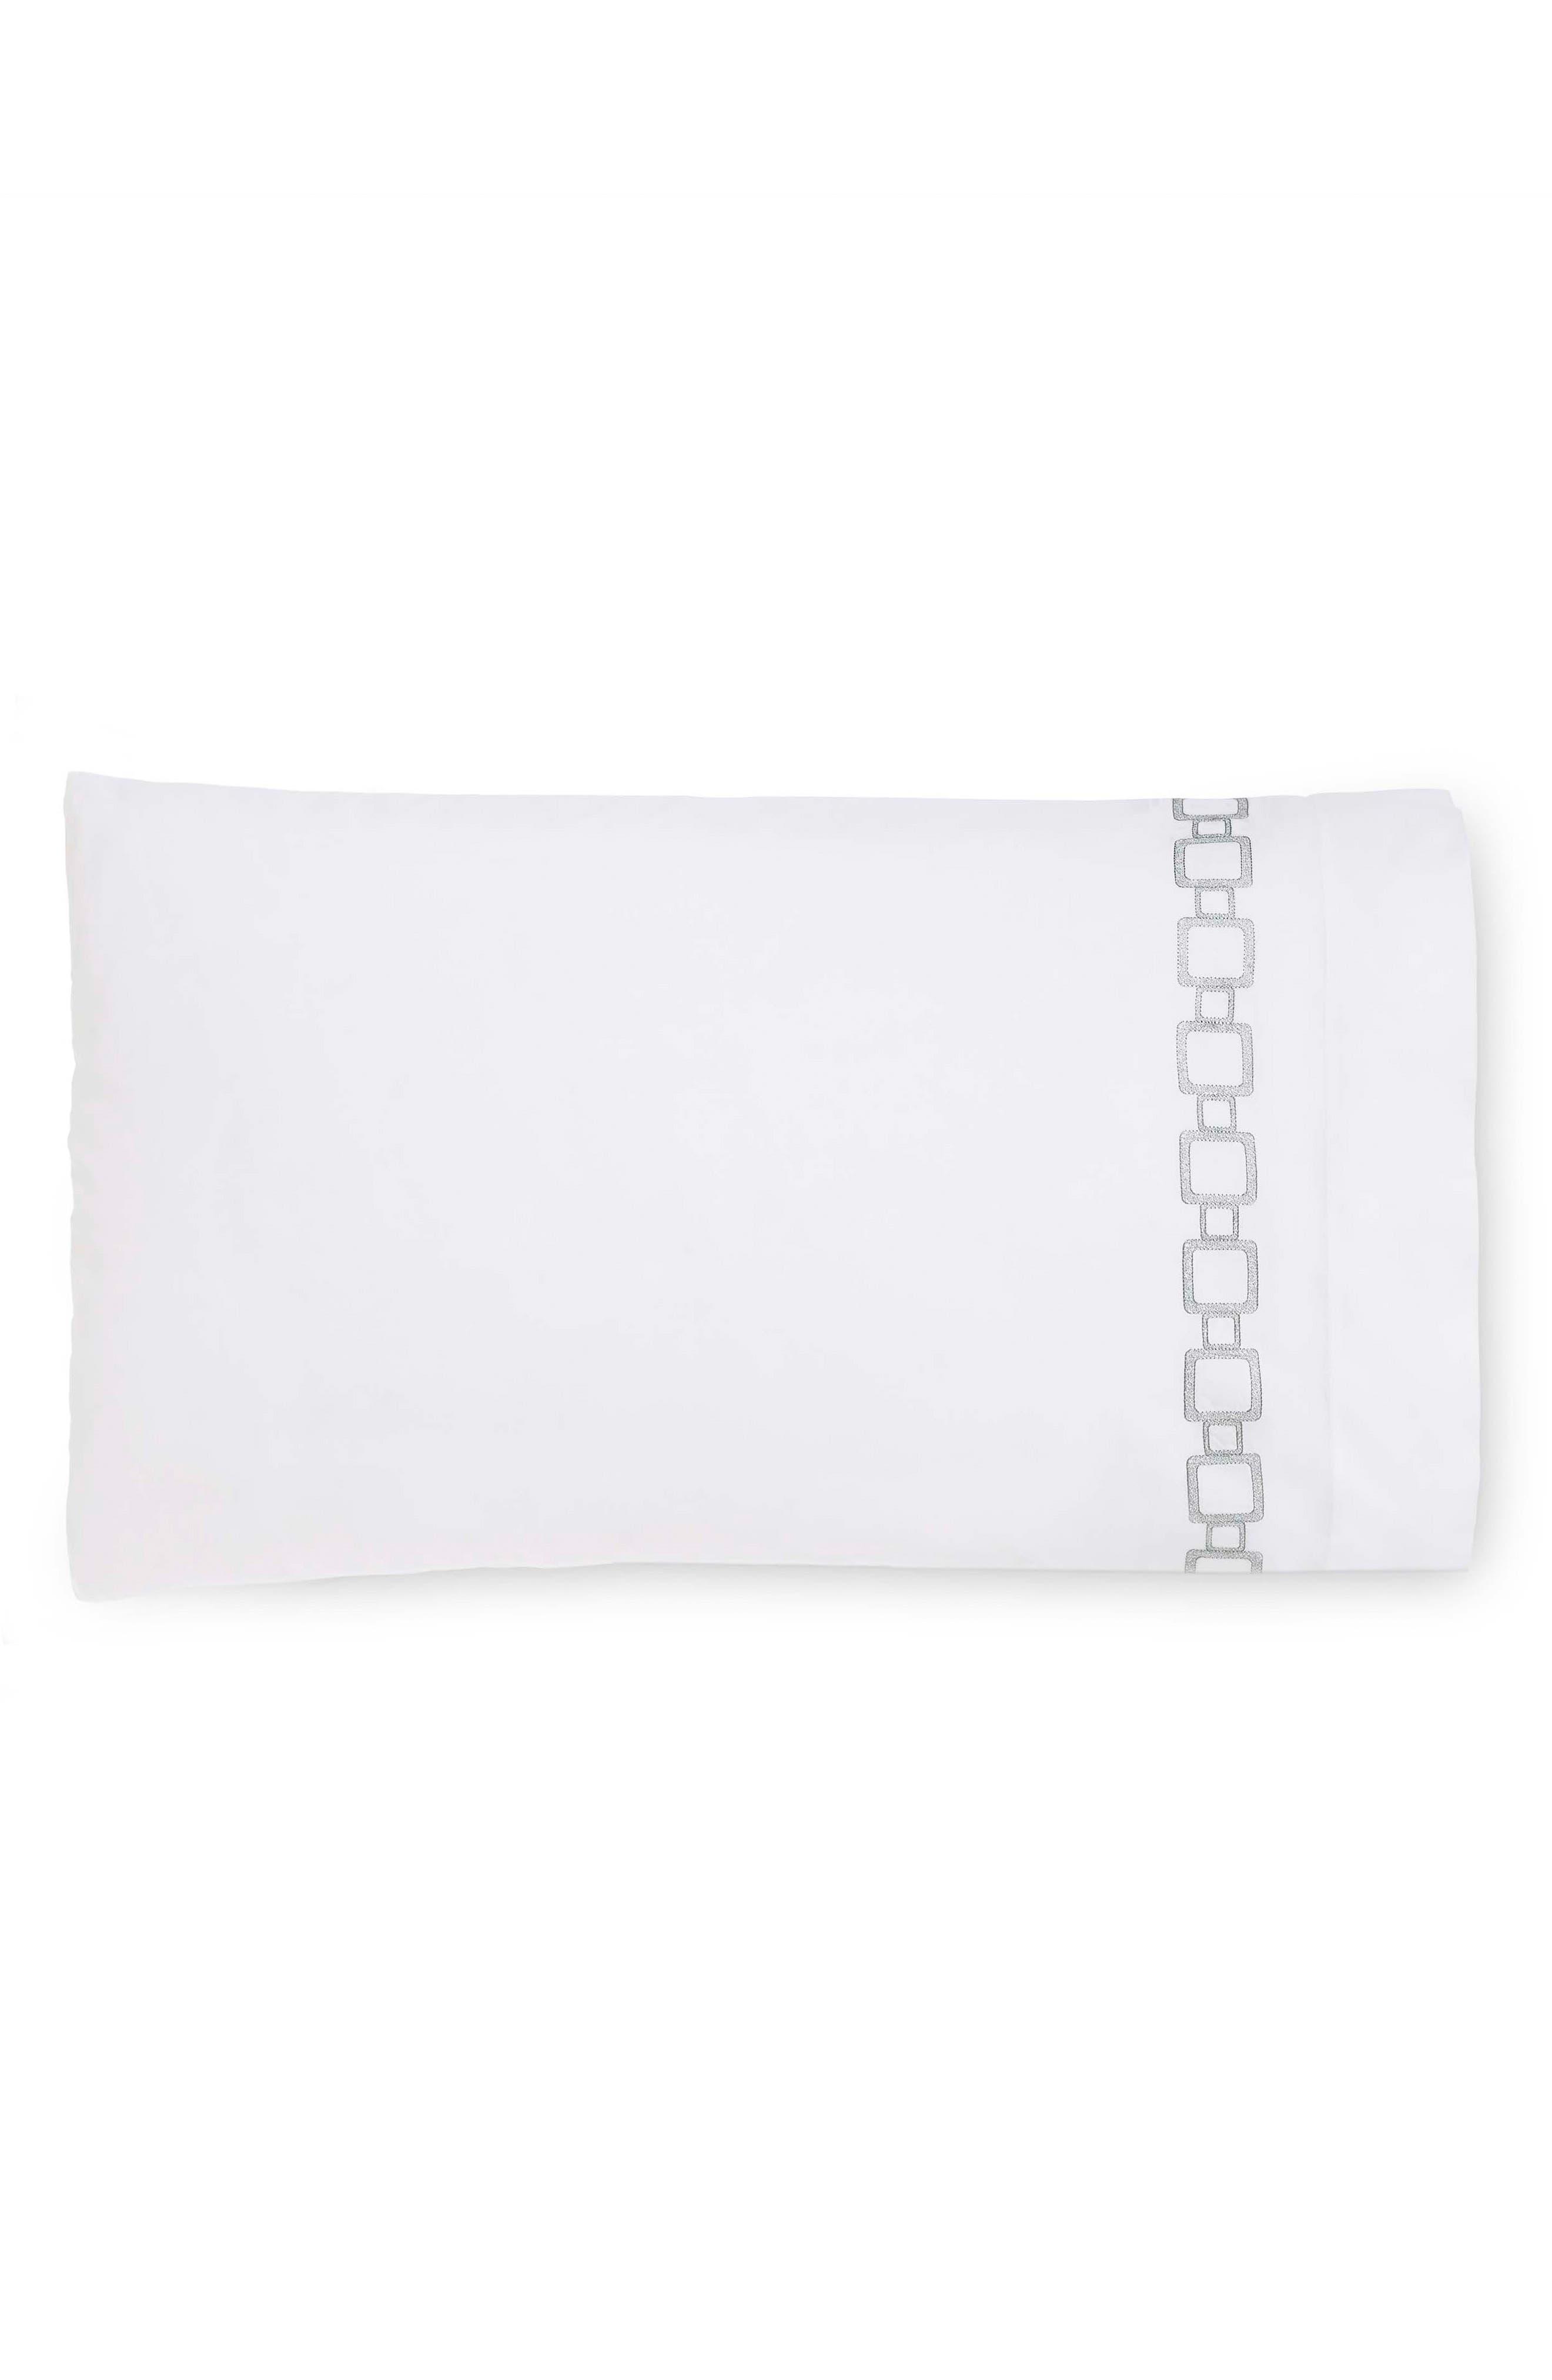 Vessa Pillowcase,                             Main thumbnail 1, color,                             100